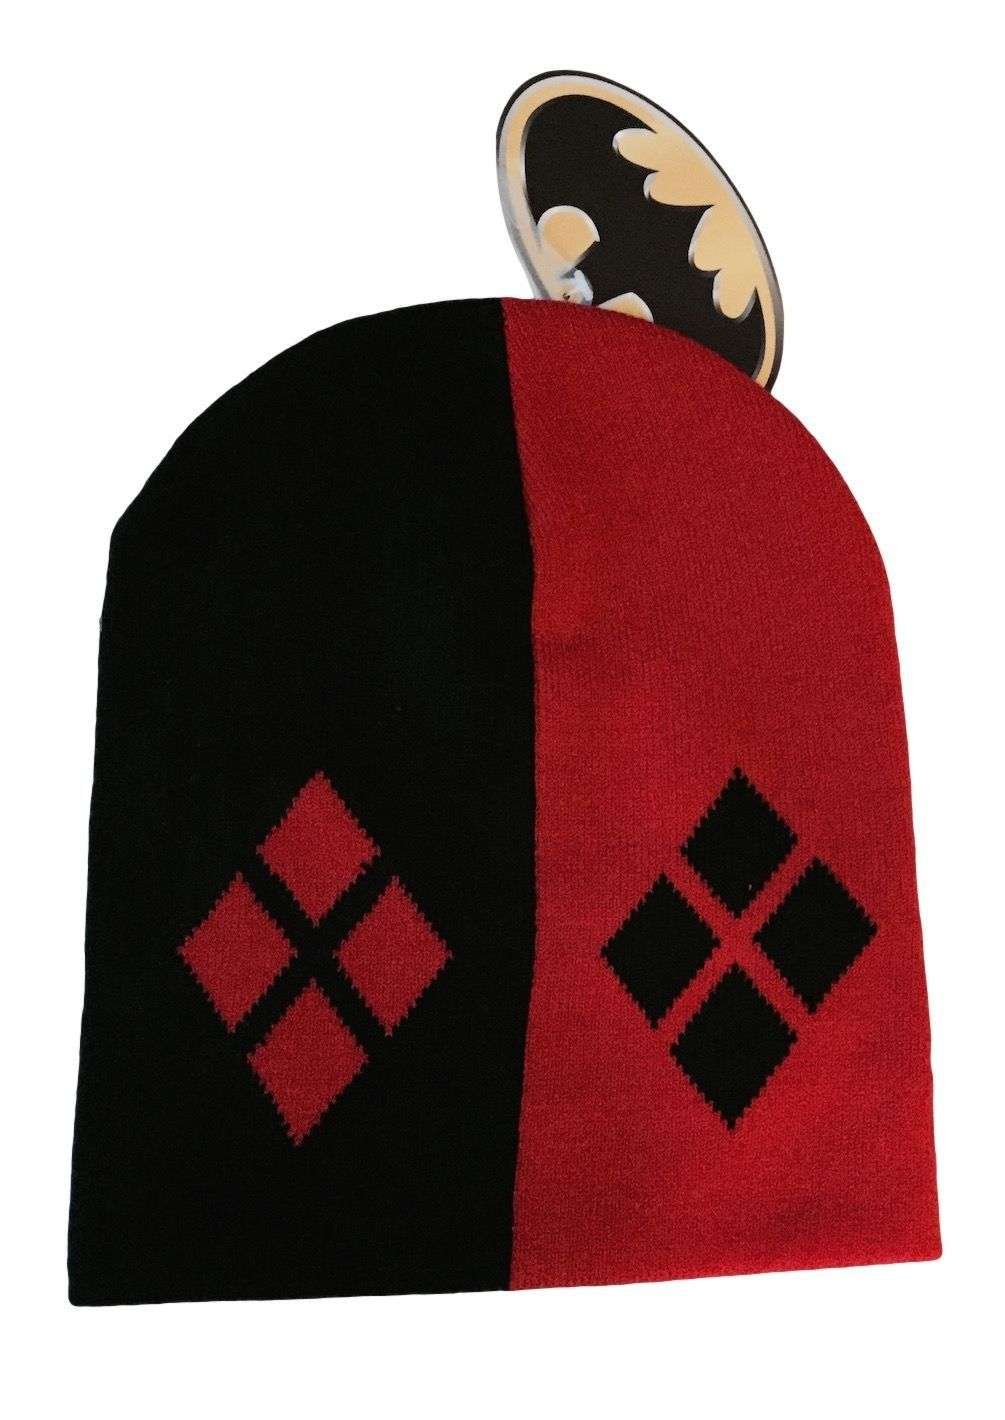 e4b178c8a02 Harley Quinn Symbol Black and Red Slouch Knit Beanie Hat DC Comics Batman  NWT